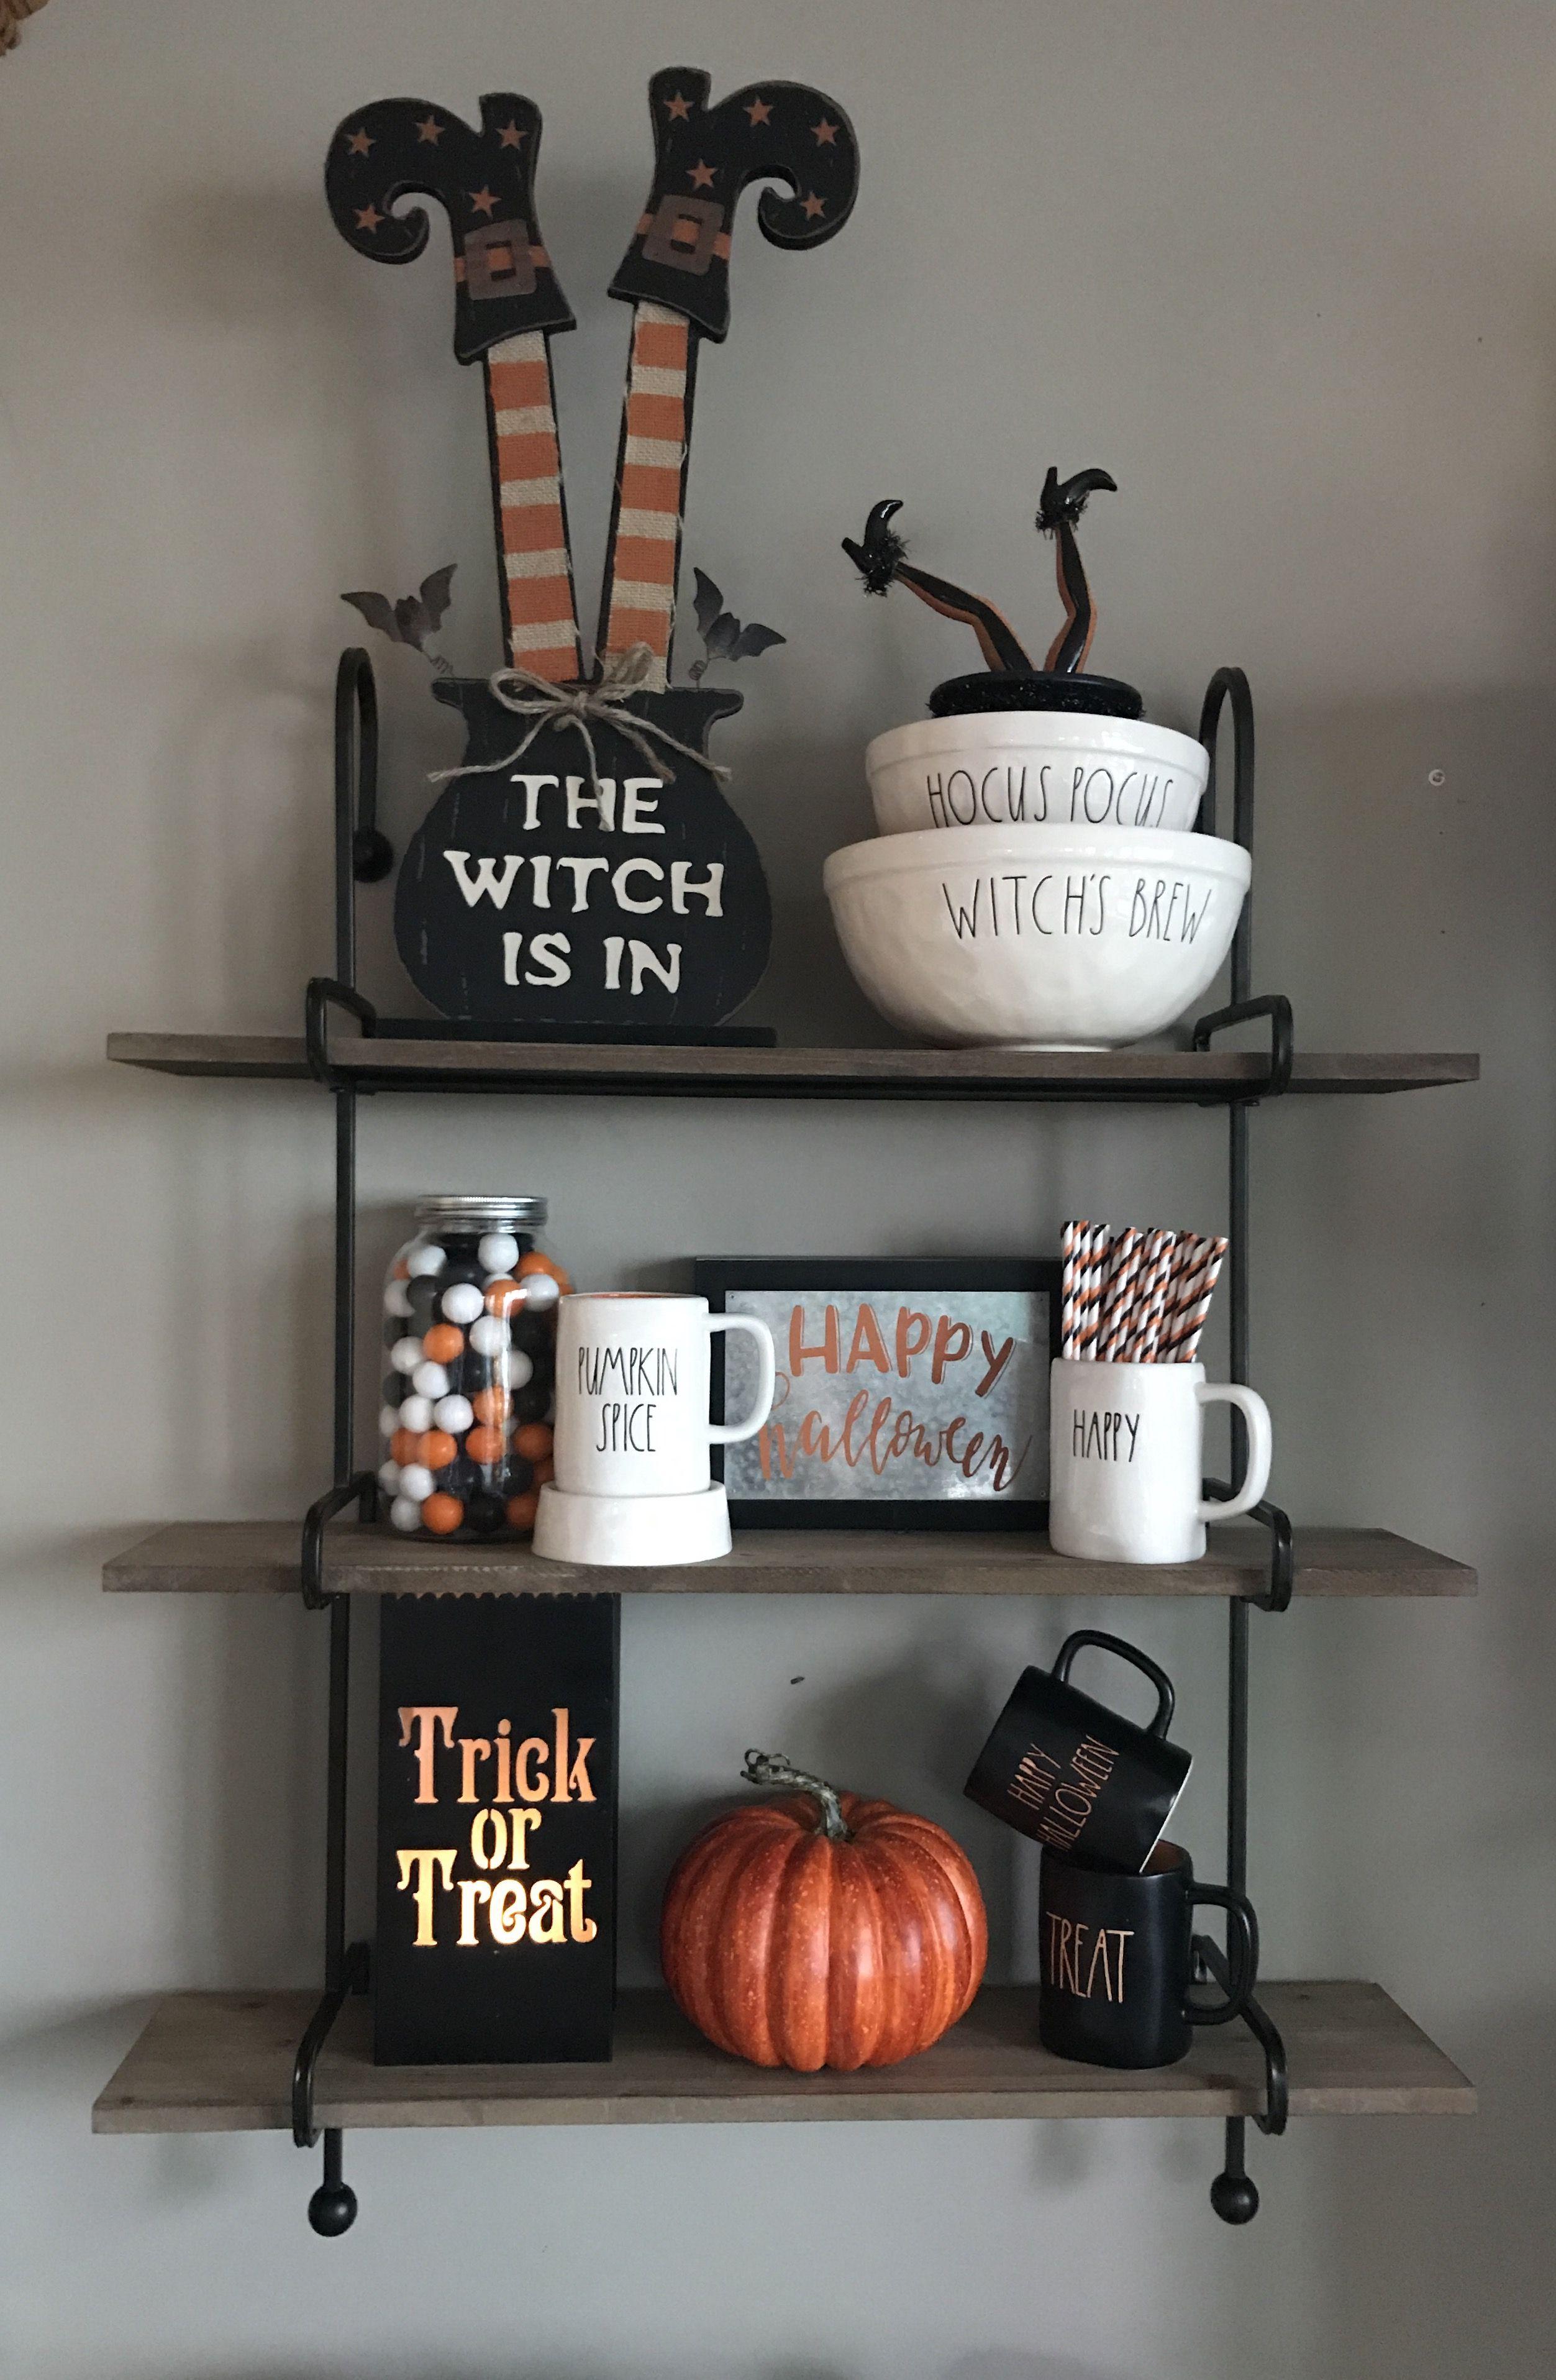 My Halloween Display Rae Dunn Hocus Pocus Witches Brew Trick Or Treat Ha Halloween Kitchen Dollar Store Halloween Decorations Spooky Halloween Decorations